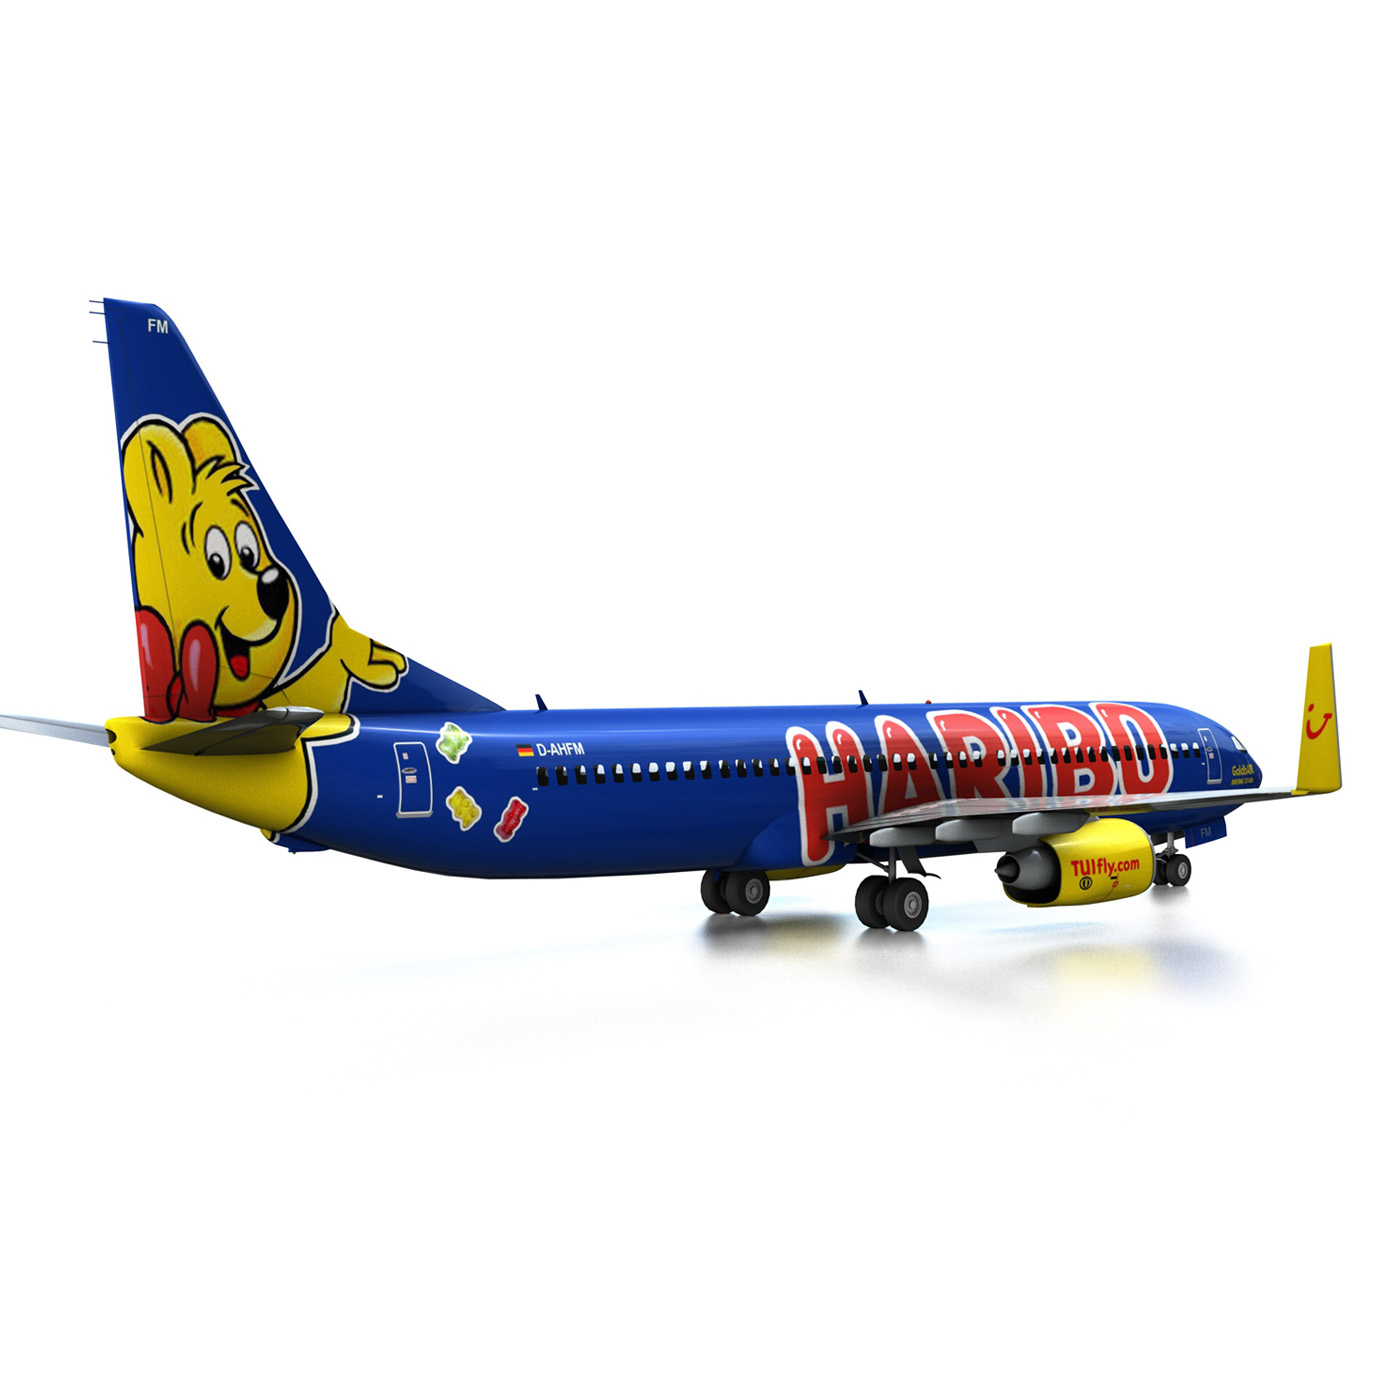 boeing 737-800 goldbair 3d model 3ds fbx c4d lwo obj 293497